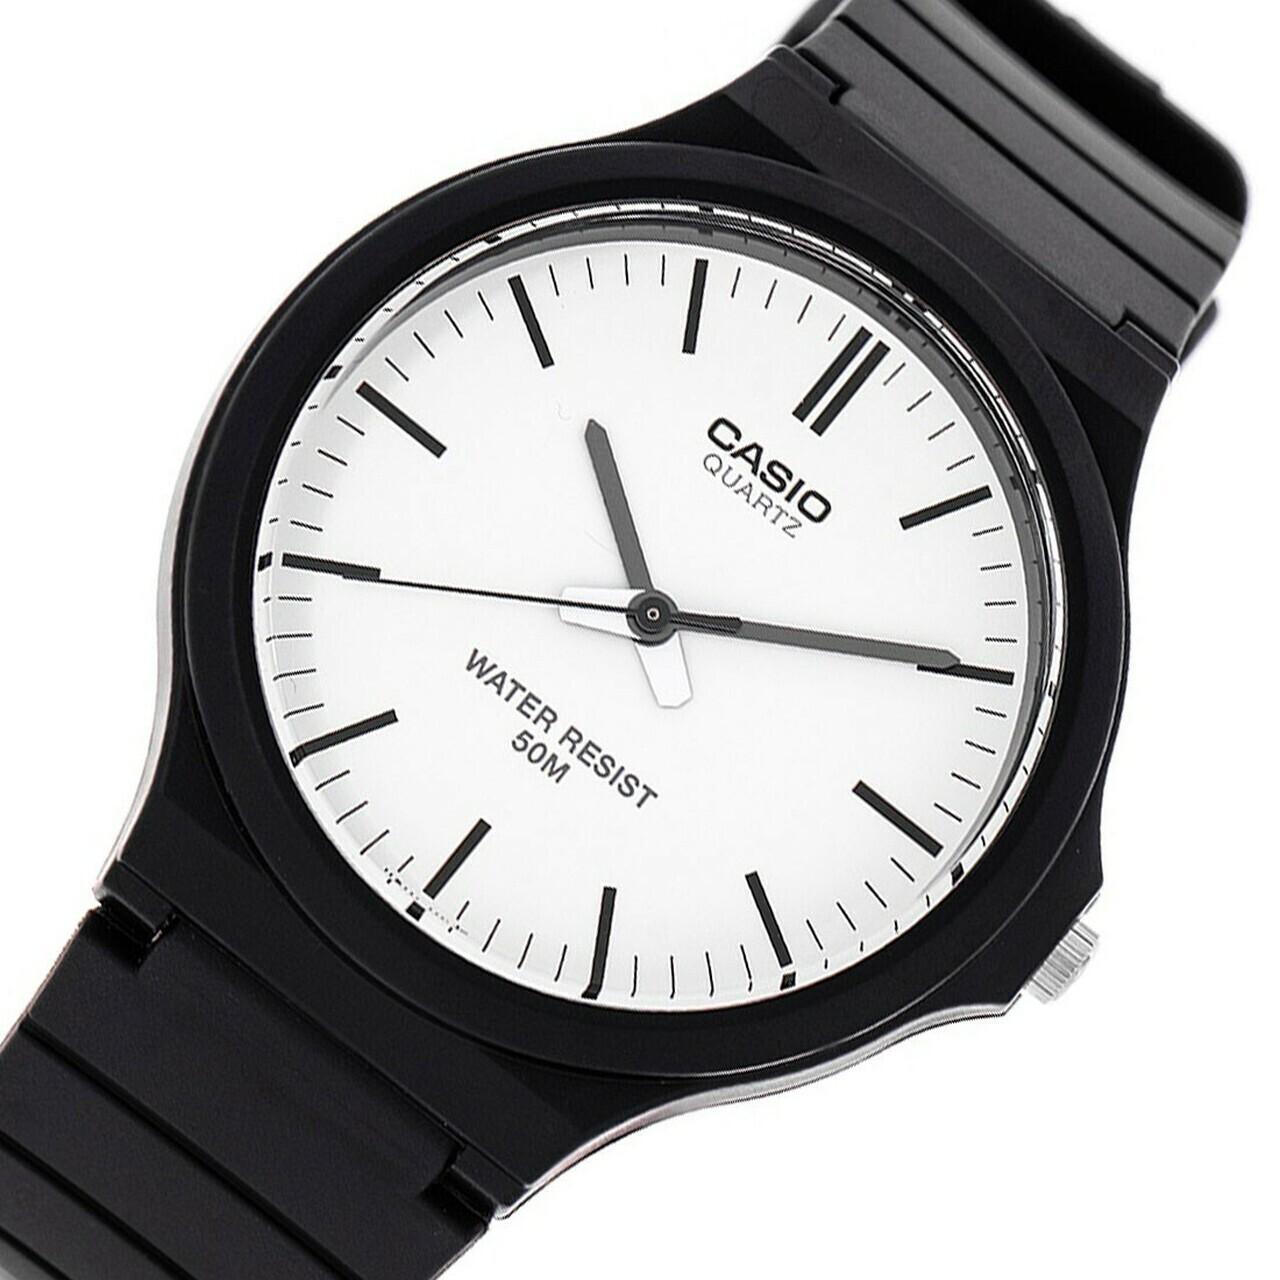 reloj clásico hombre Casio MW-240-7E dial blanco correa resina